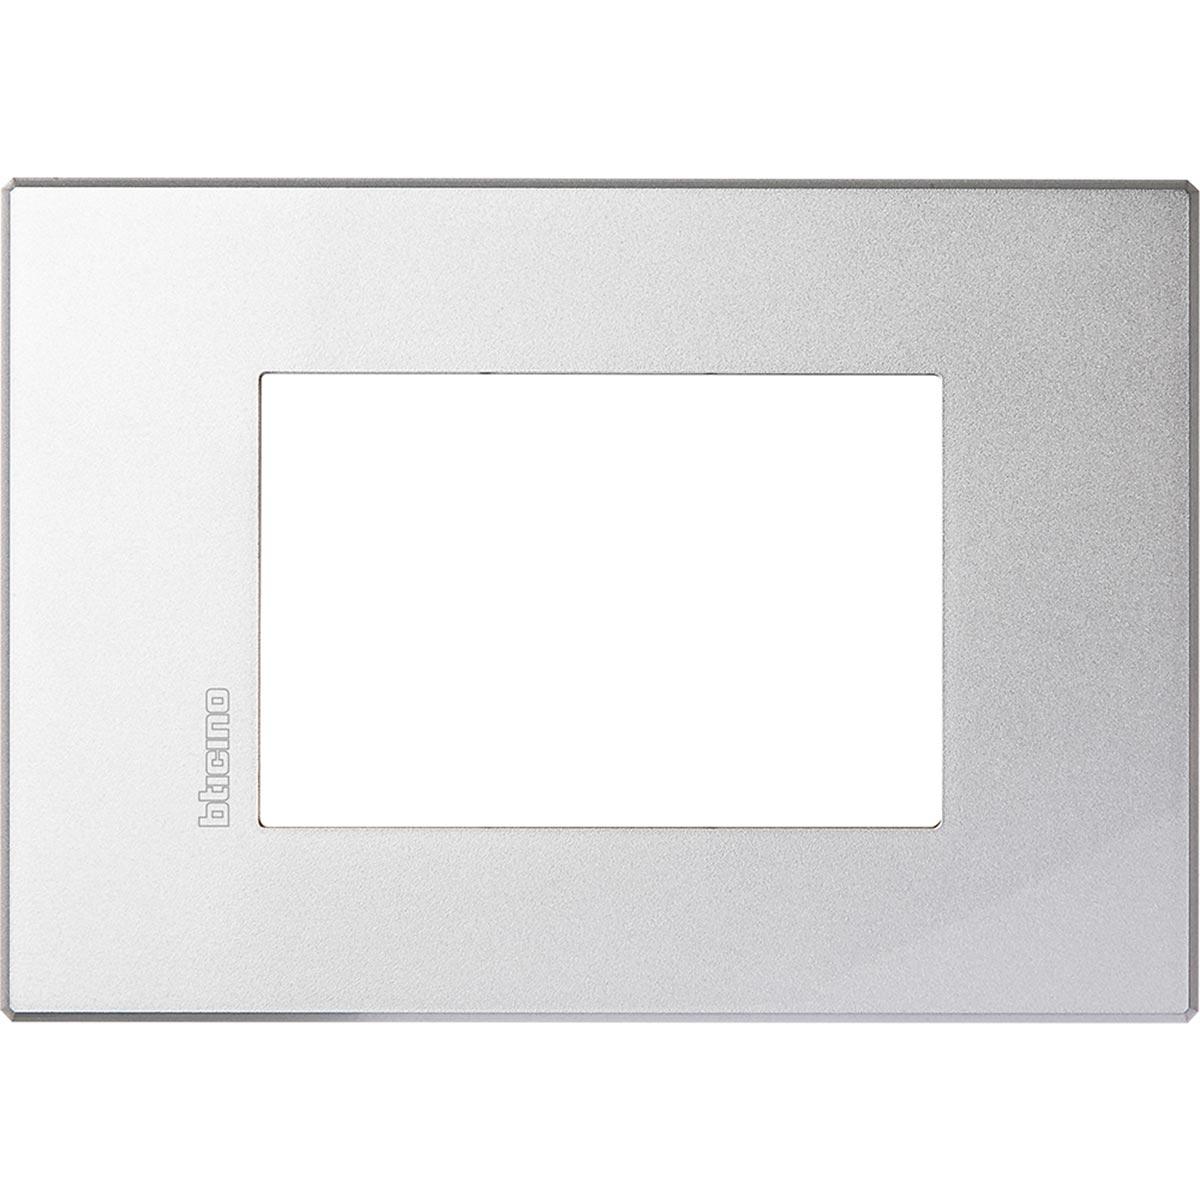 HW4803HC axolute bticino placche air alluminio 3 posti